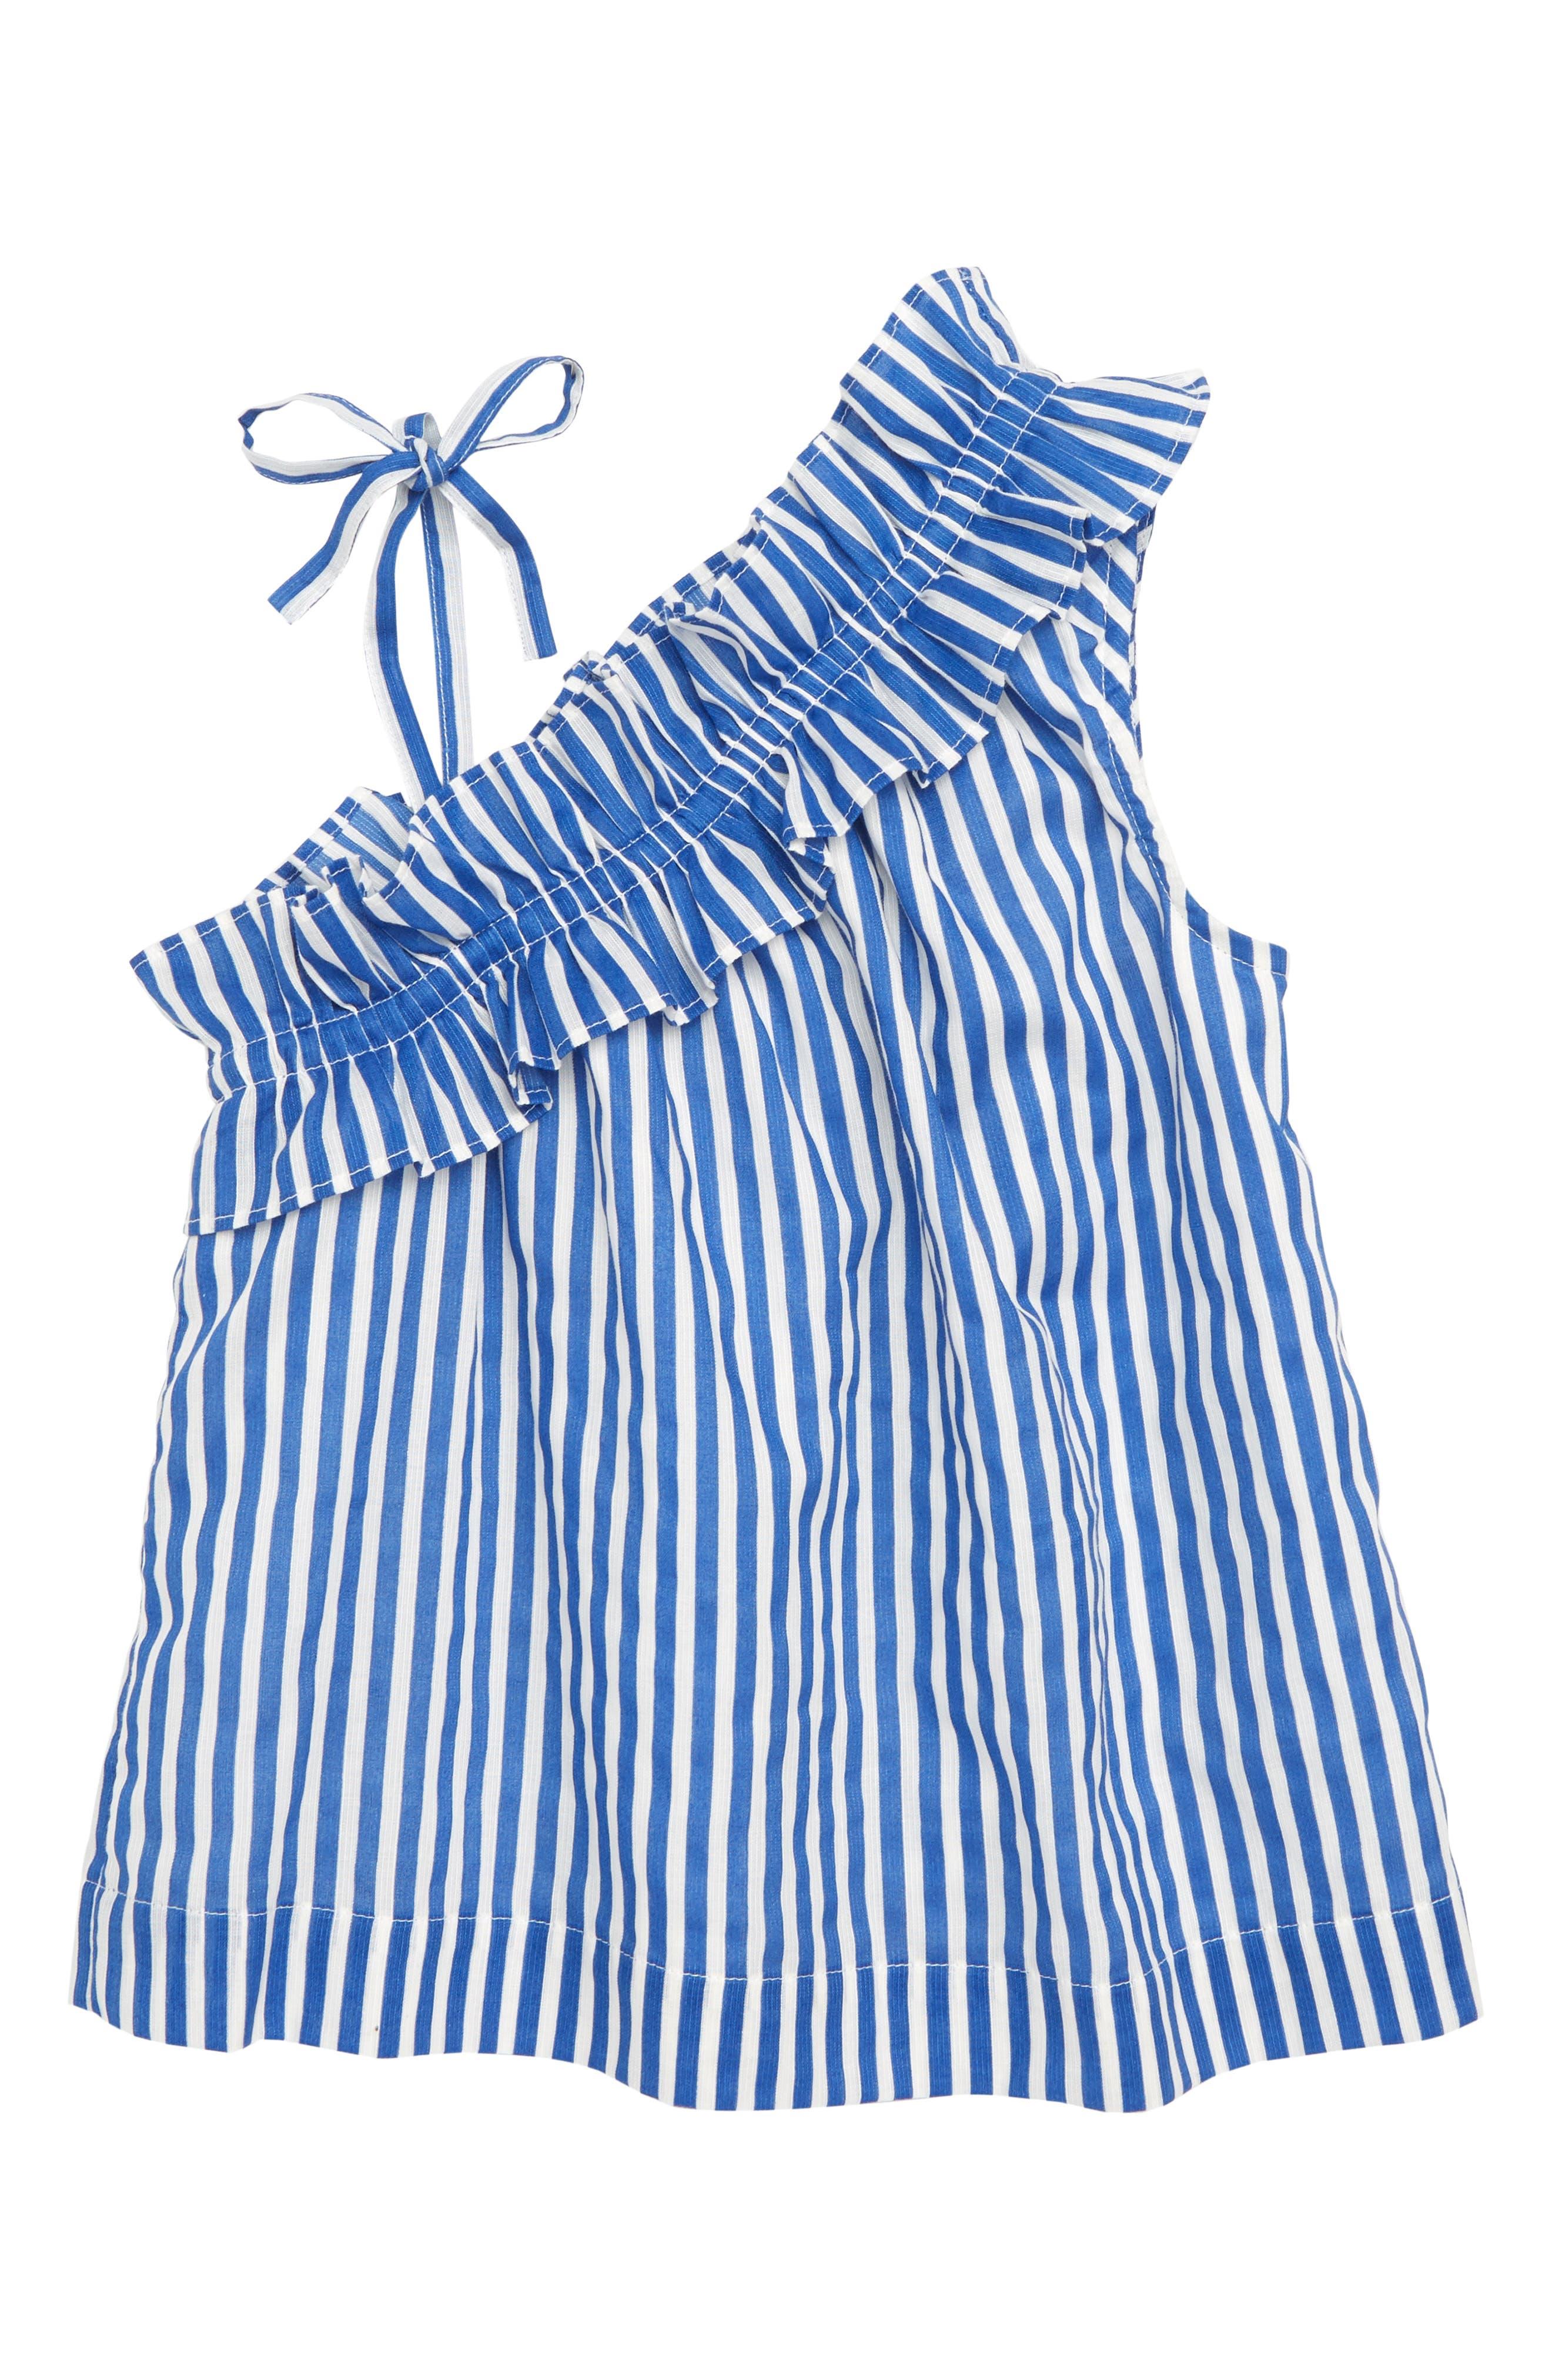 Stripe Asymmetrical Ruffle Top,                             Main thumbnail 1, color,                             400